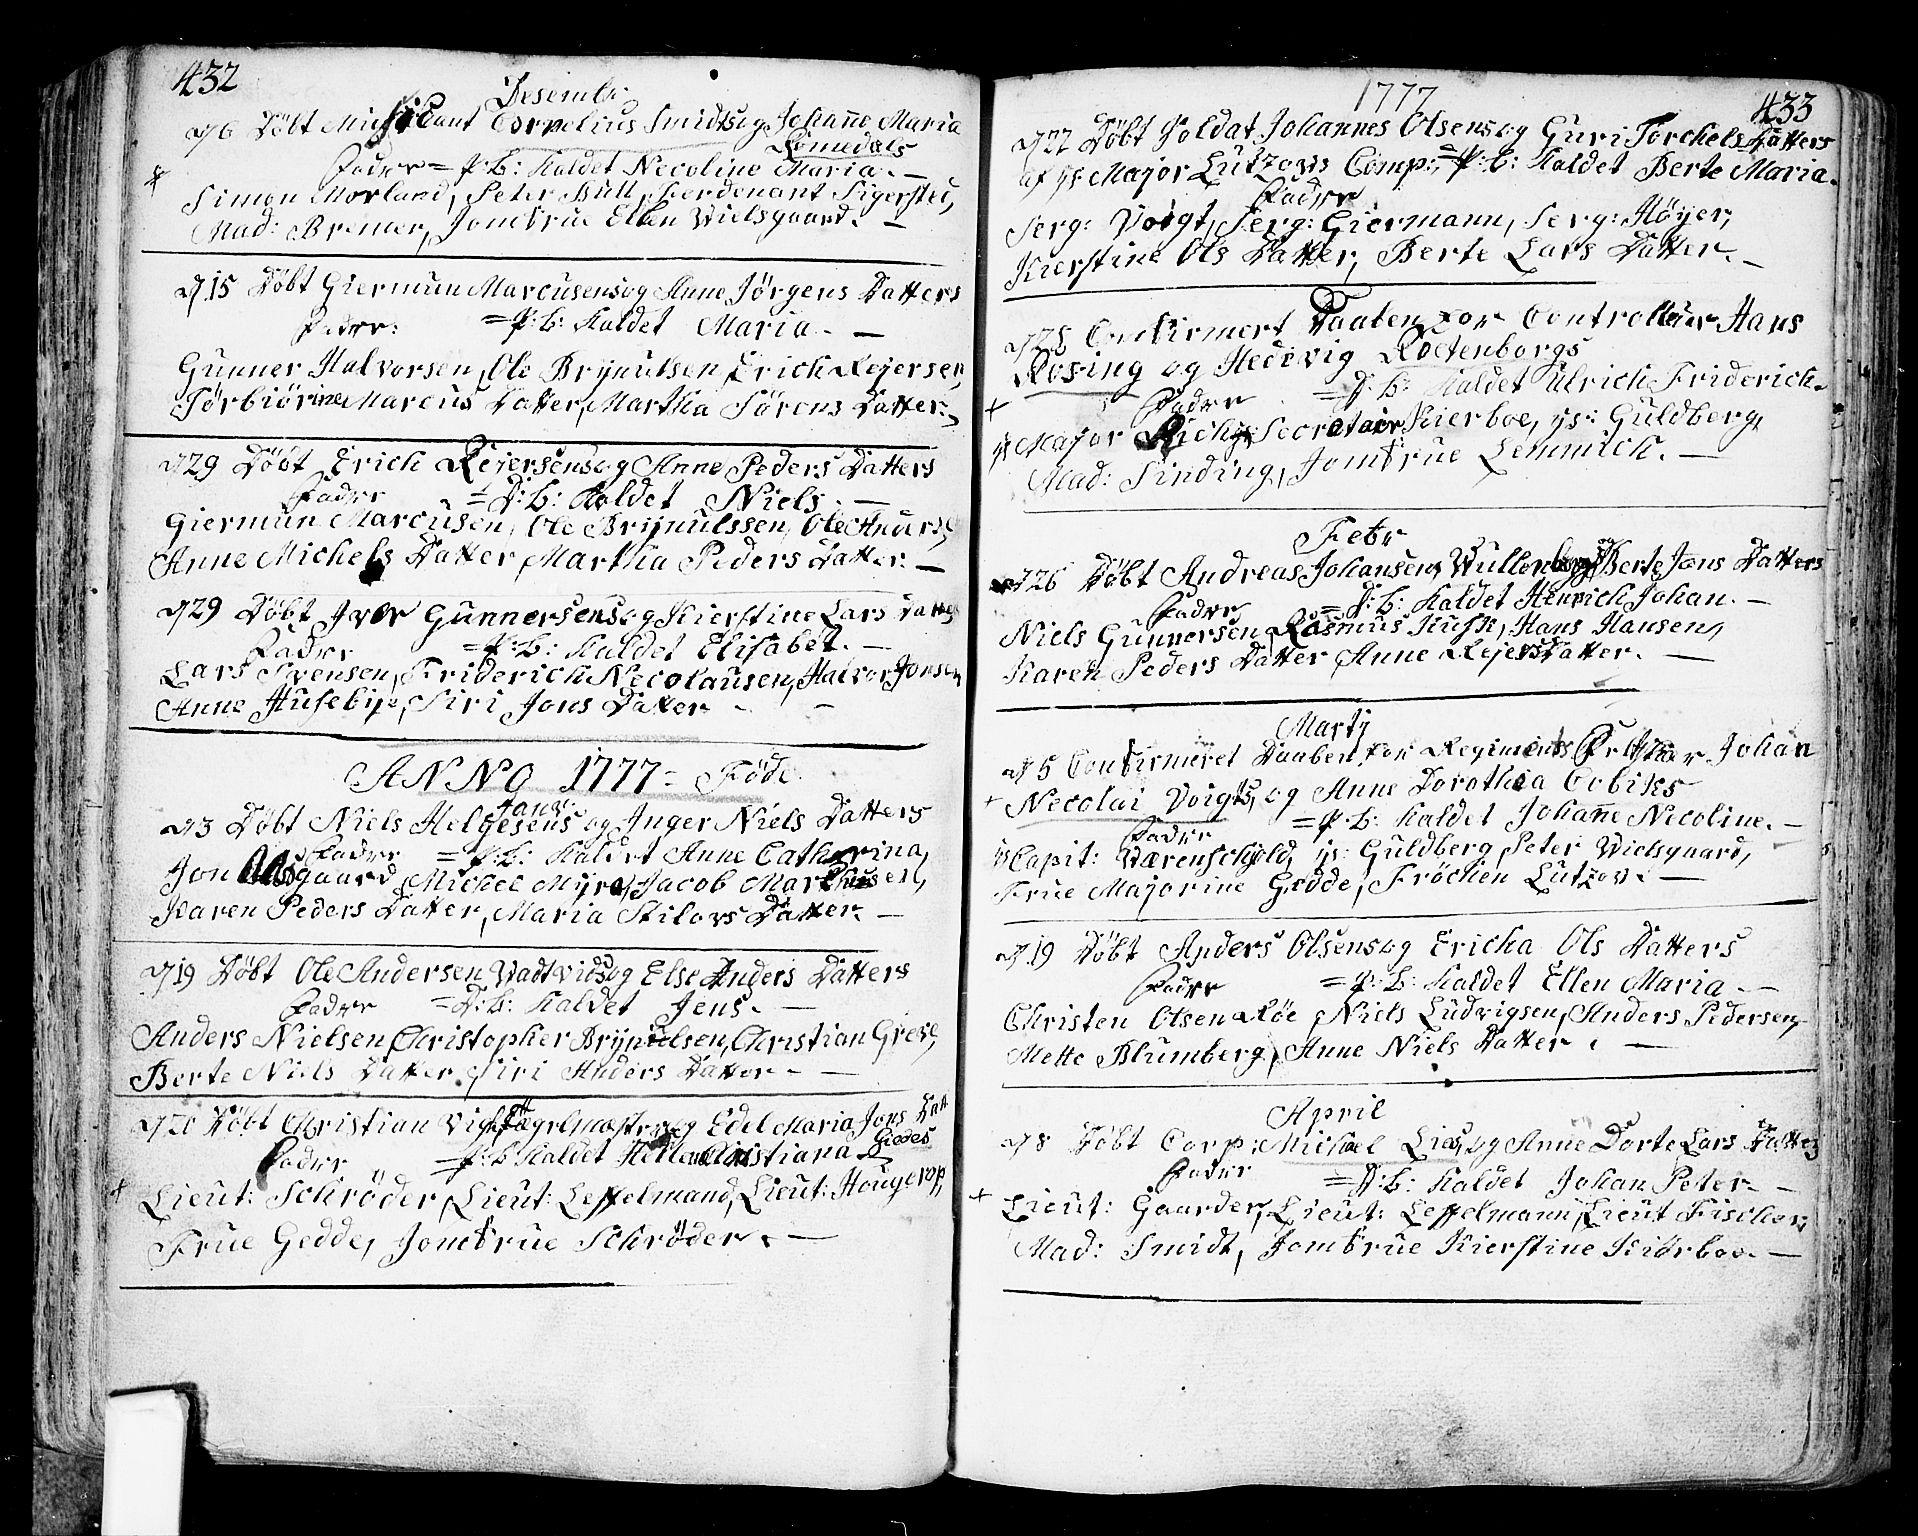 SAO, Fredrikstad prestekontor Kirkebøker, F/Fa/L0002: Ministerialbok nr. 2, 1750-1804, s. 432-433